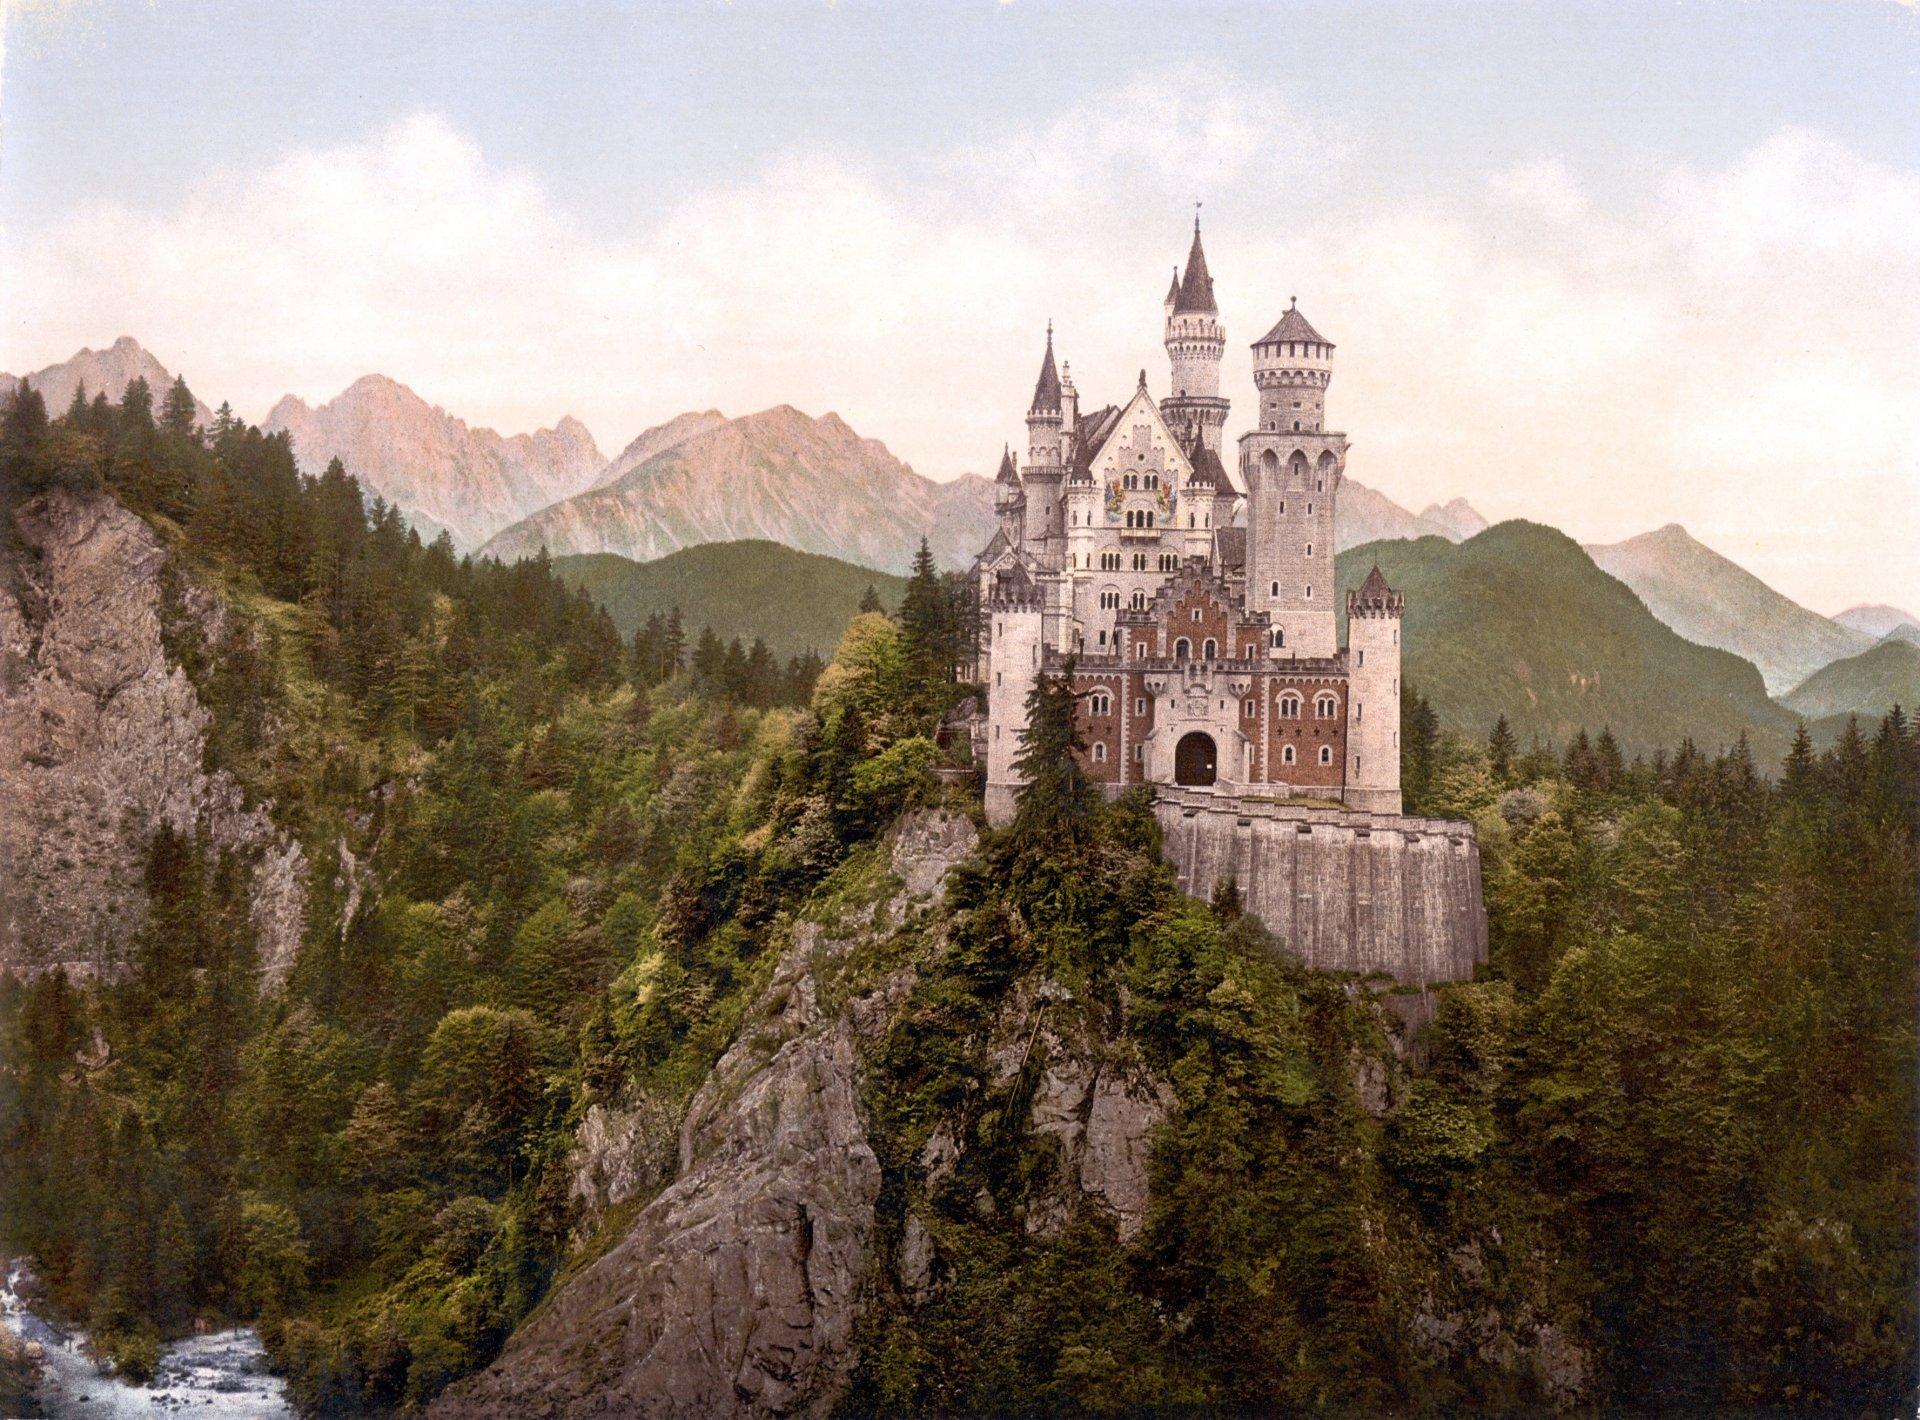 Картинка замок в горах